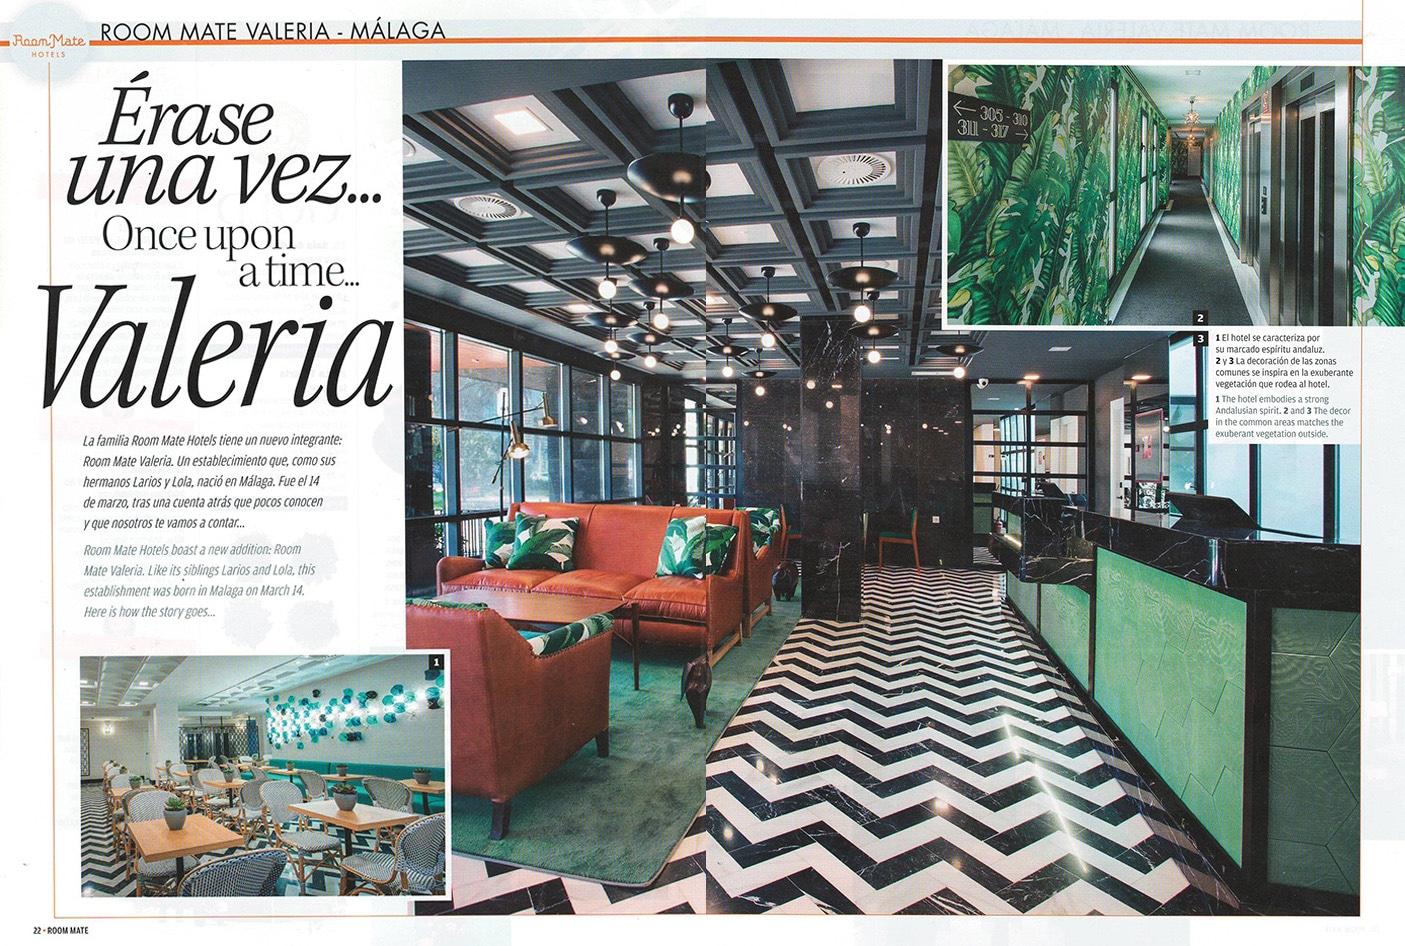 revista-roommate-hotel-valeria-melian-randolph-2016-b